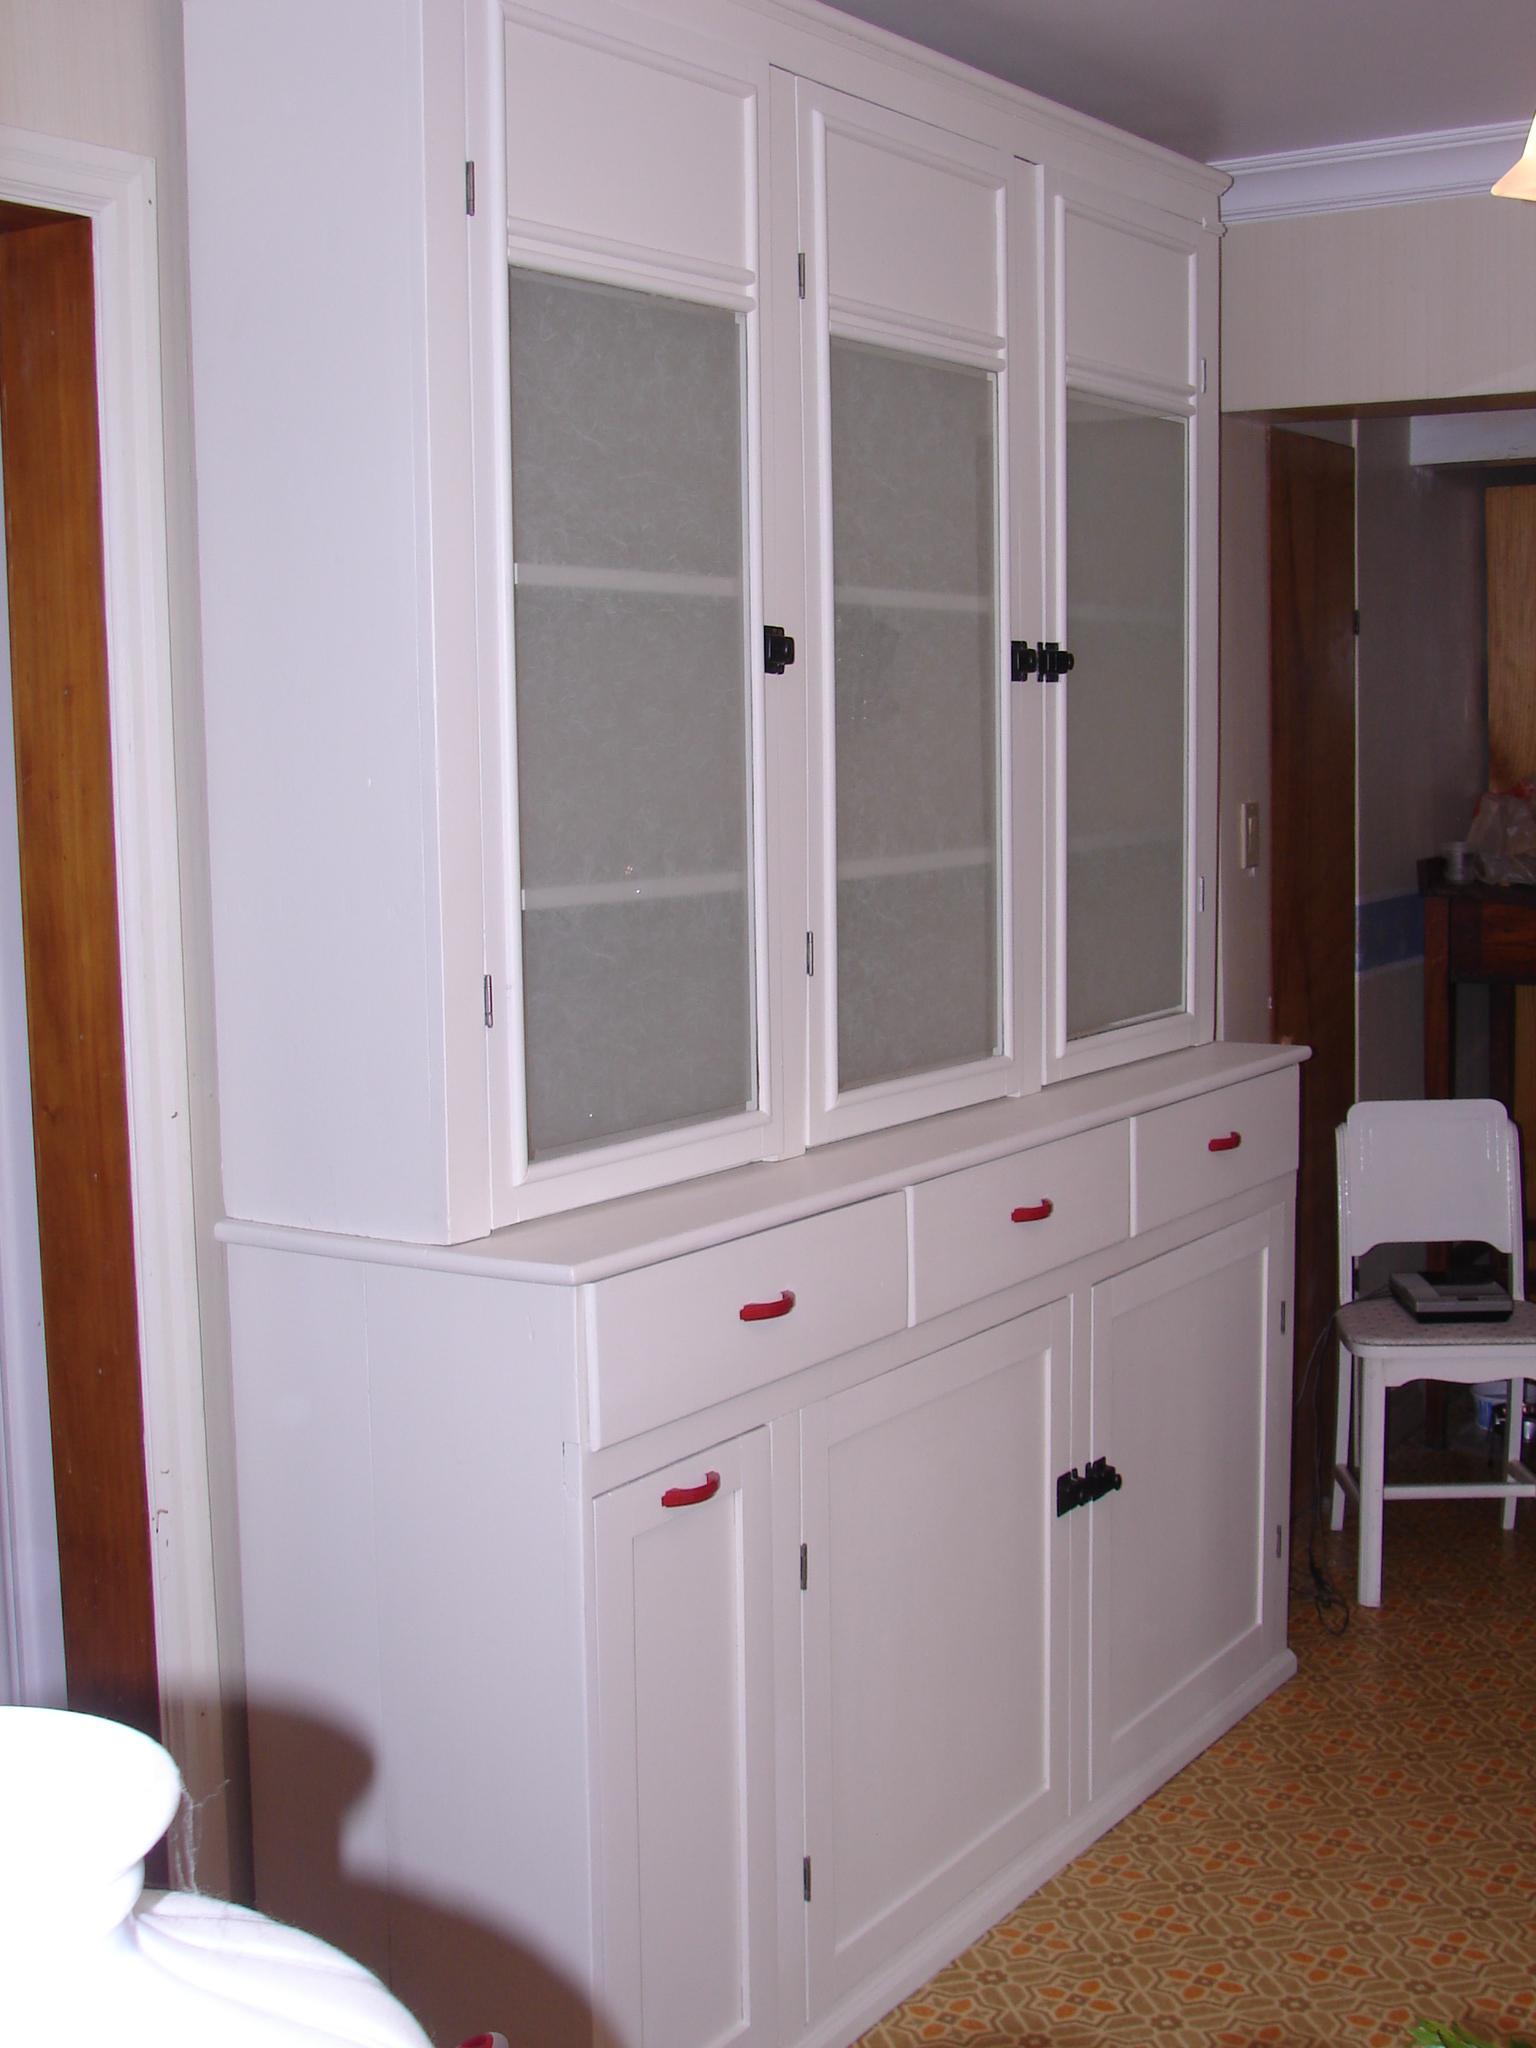 Bowmanville Kitchen Cabinets